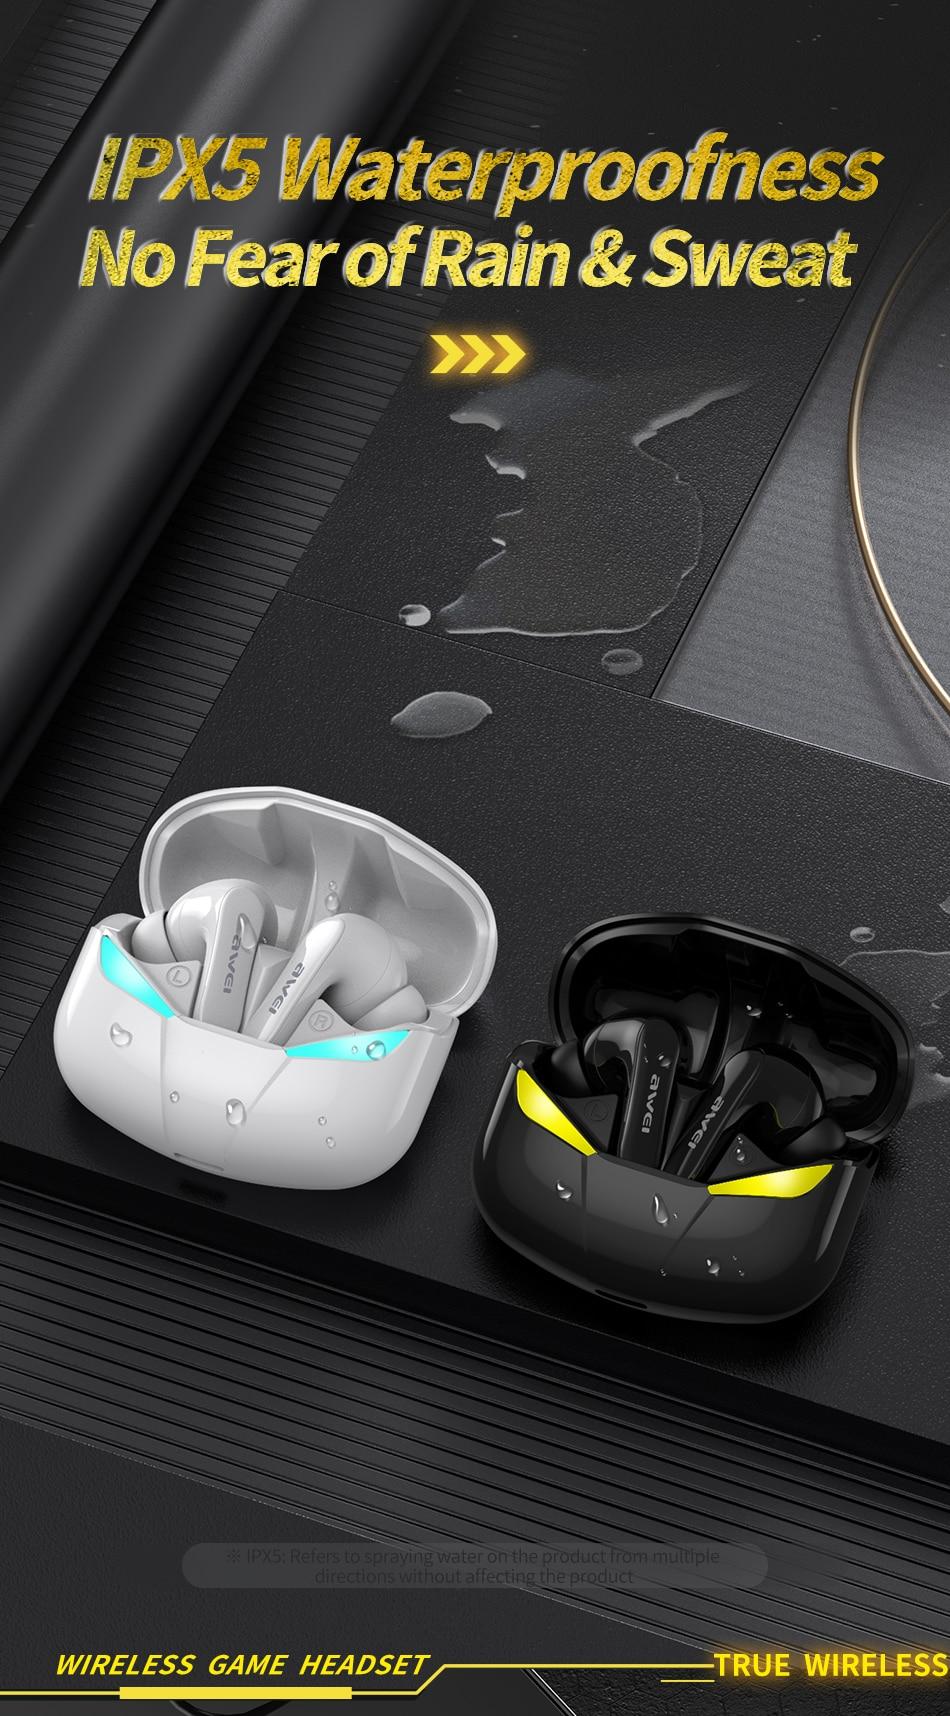 Gaming Earbuds 360° με Smart Touch In Ear - Ασύρματα Bluetooth Ακουστικά Handsfree IPX5